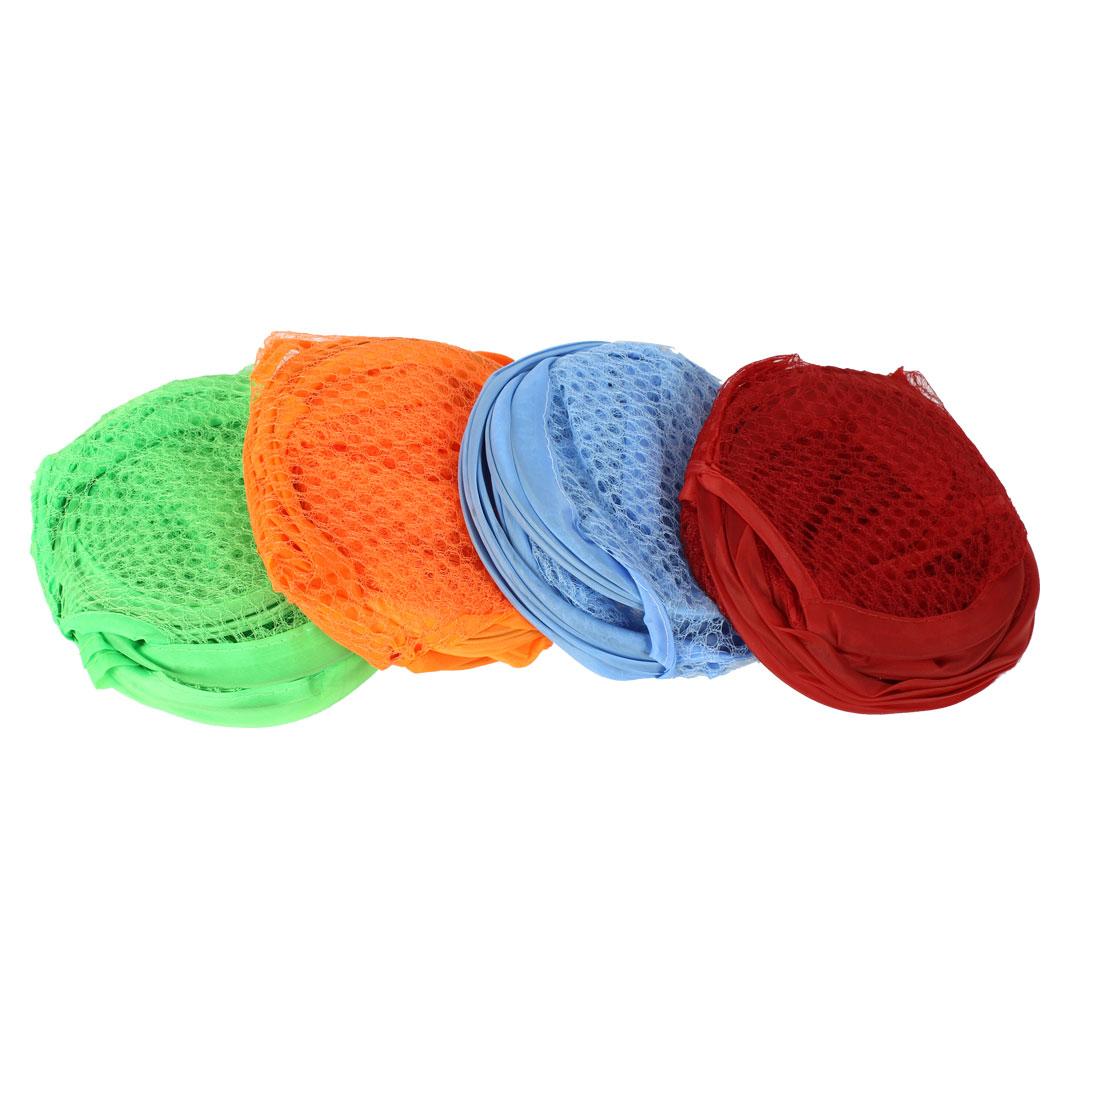 Home Mesh Underwear Bra Clothing Basket Nylon Washing Bag 4 Pcs